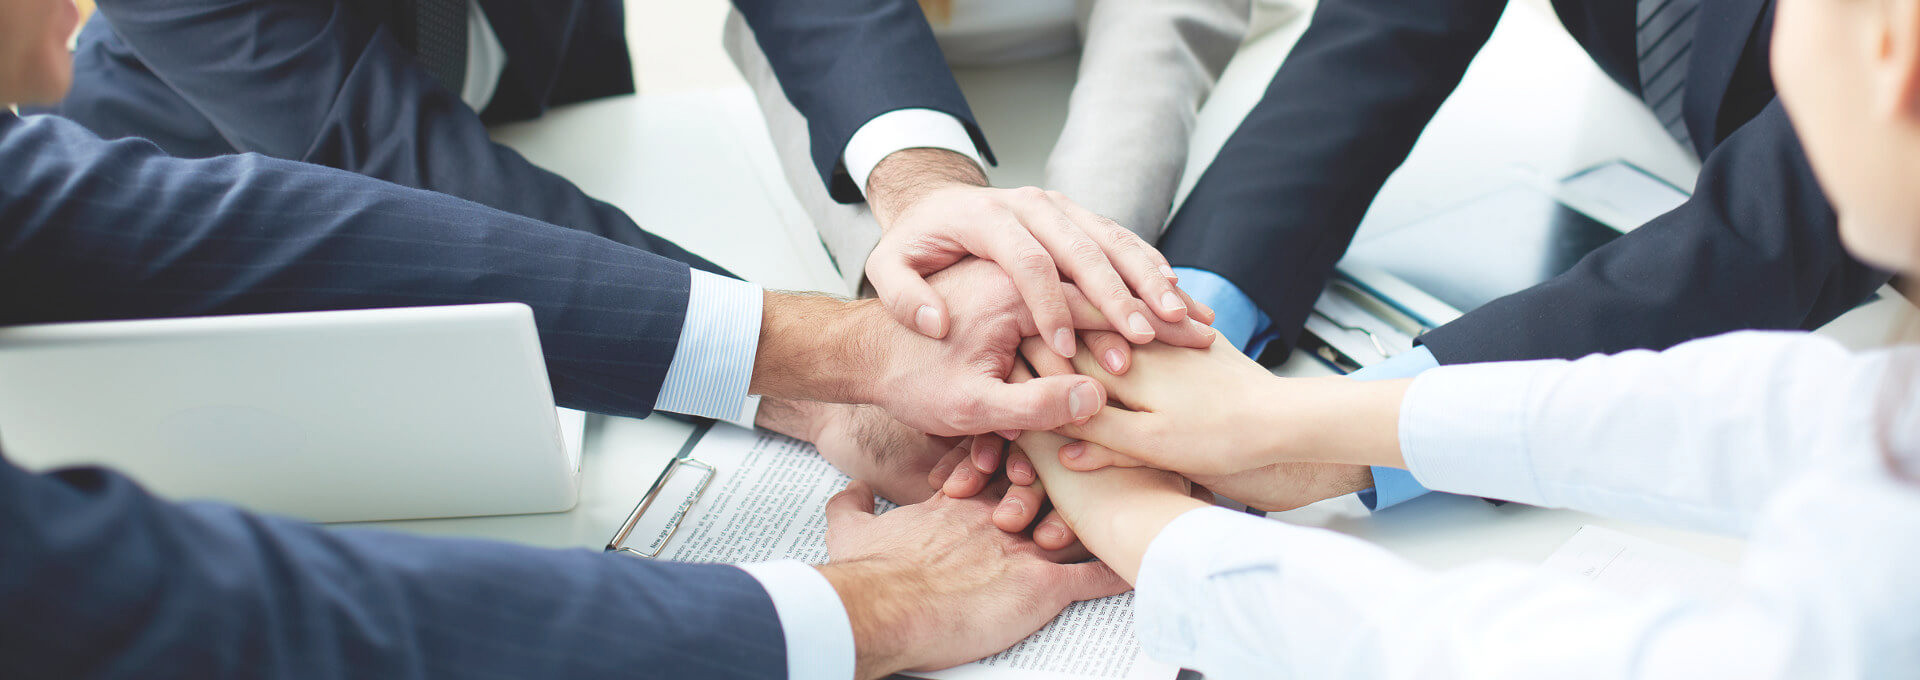 algotech-avaya-partner-customer-excellance